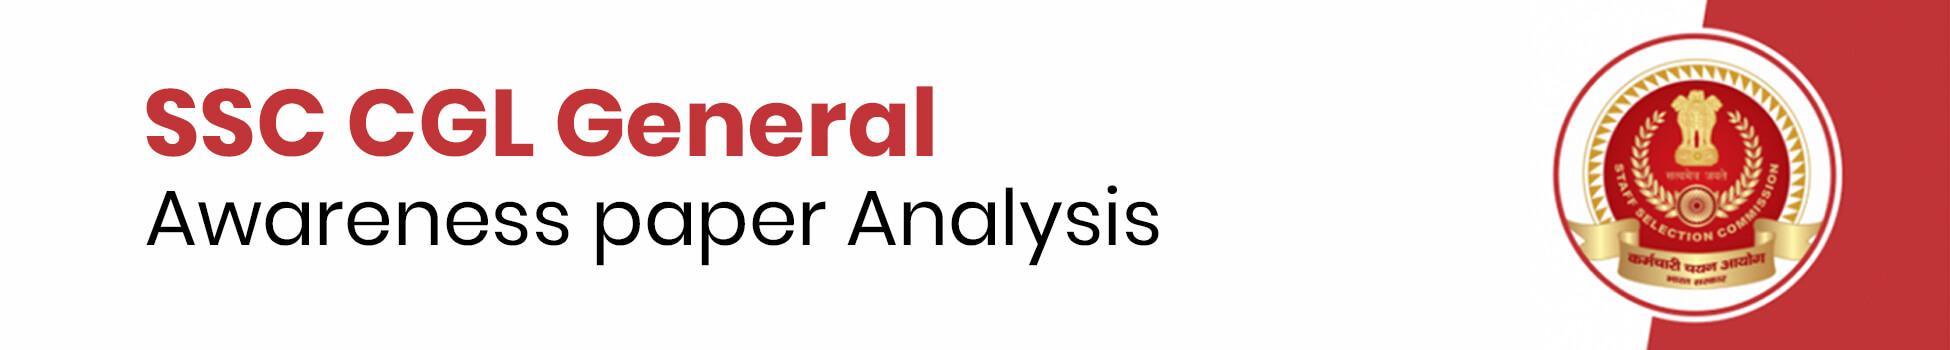 SSC CGL General Awareness paper Analysis